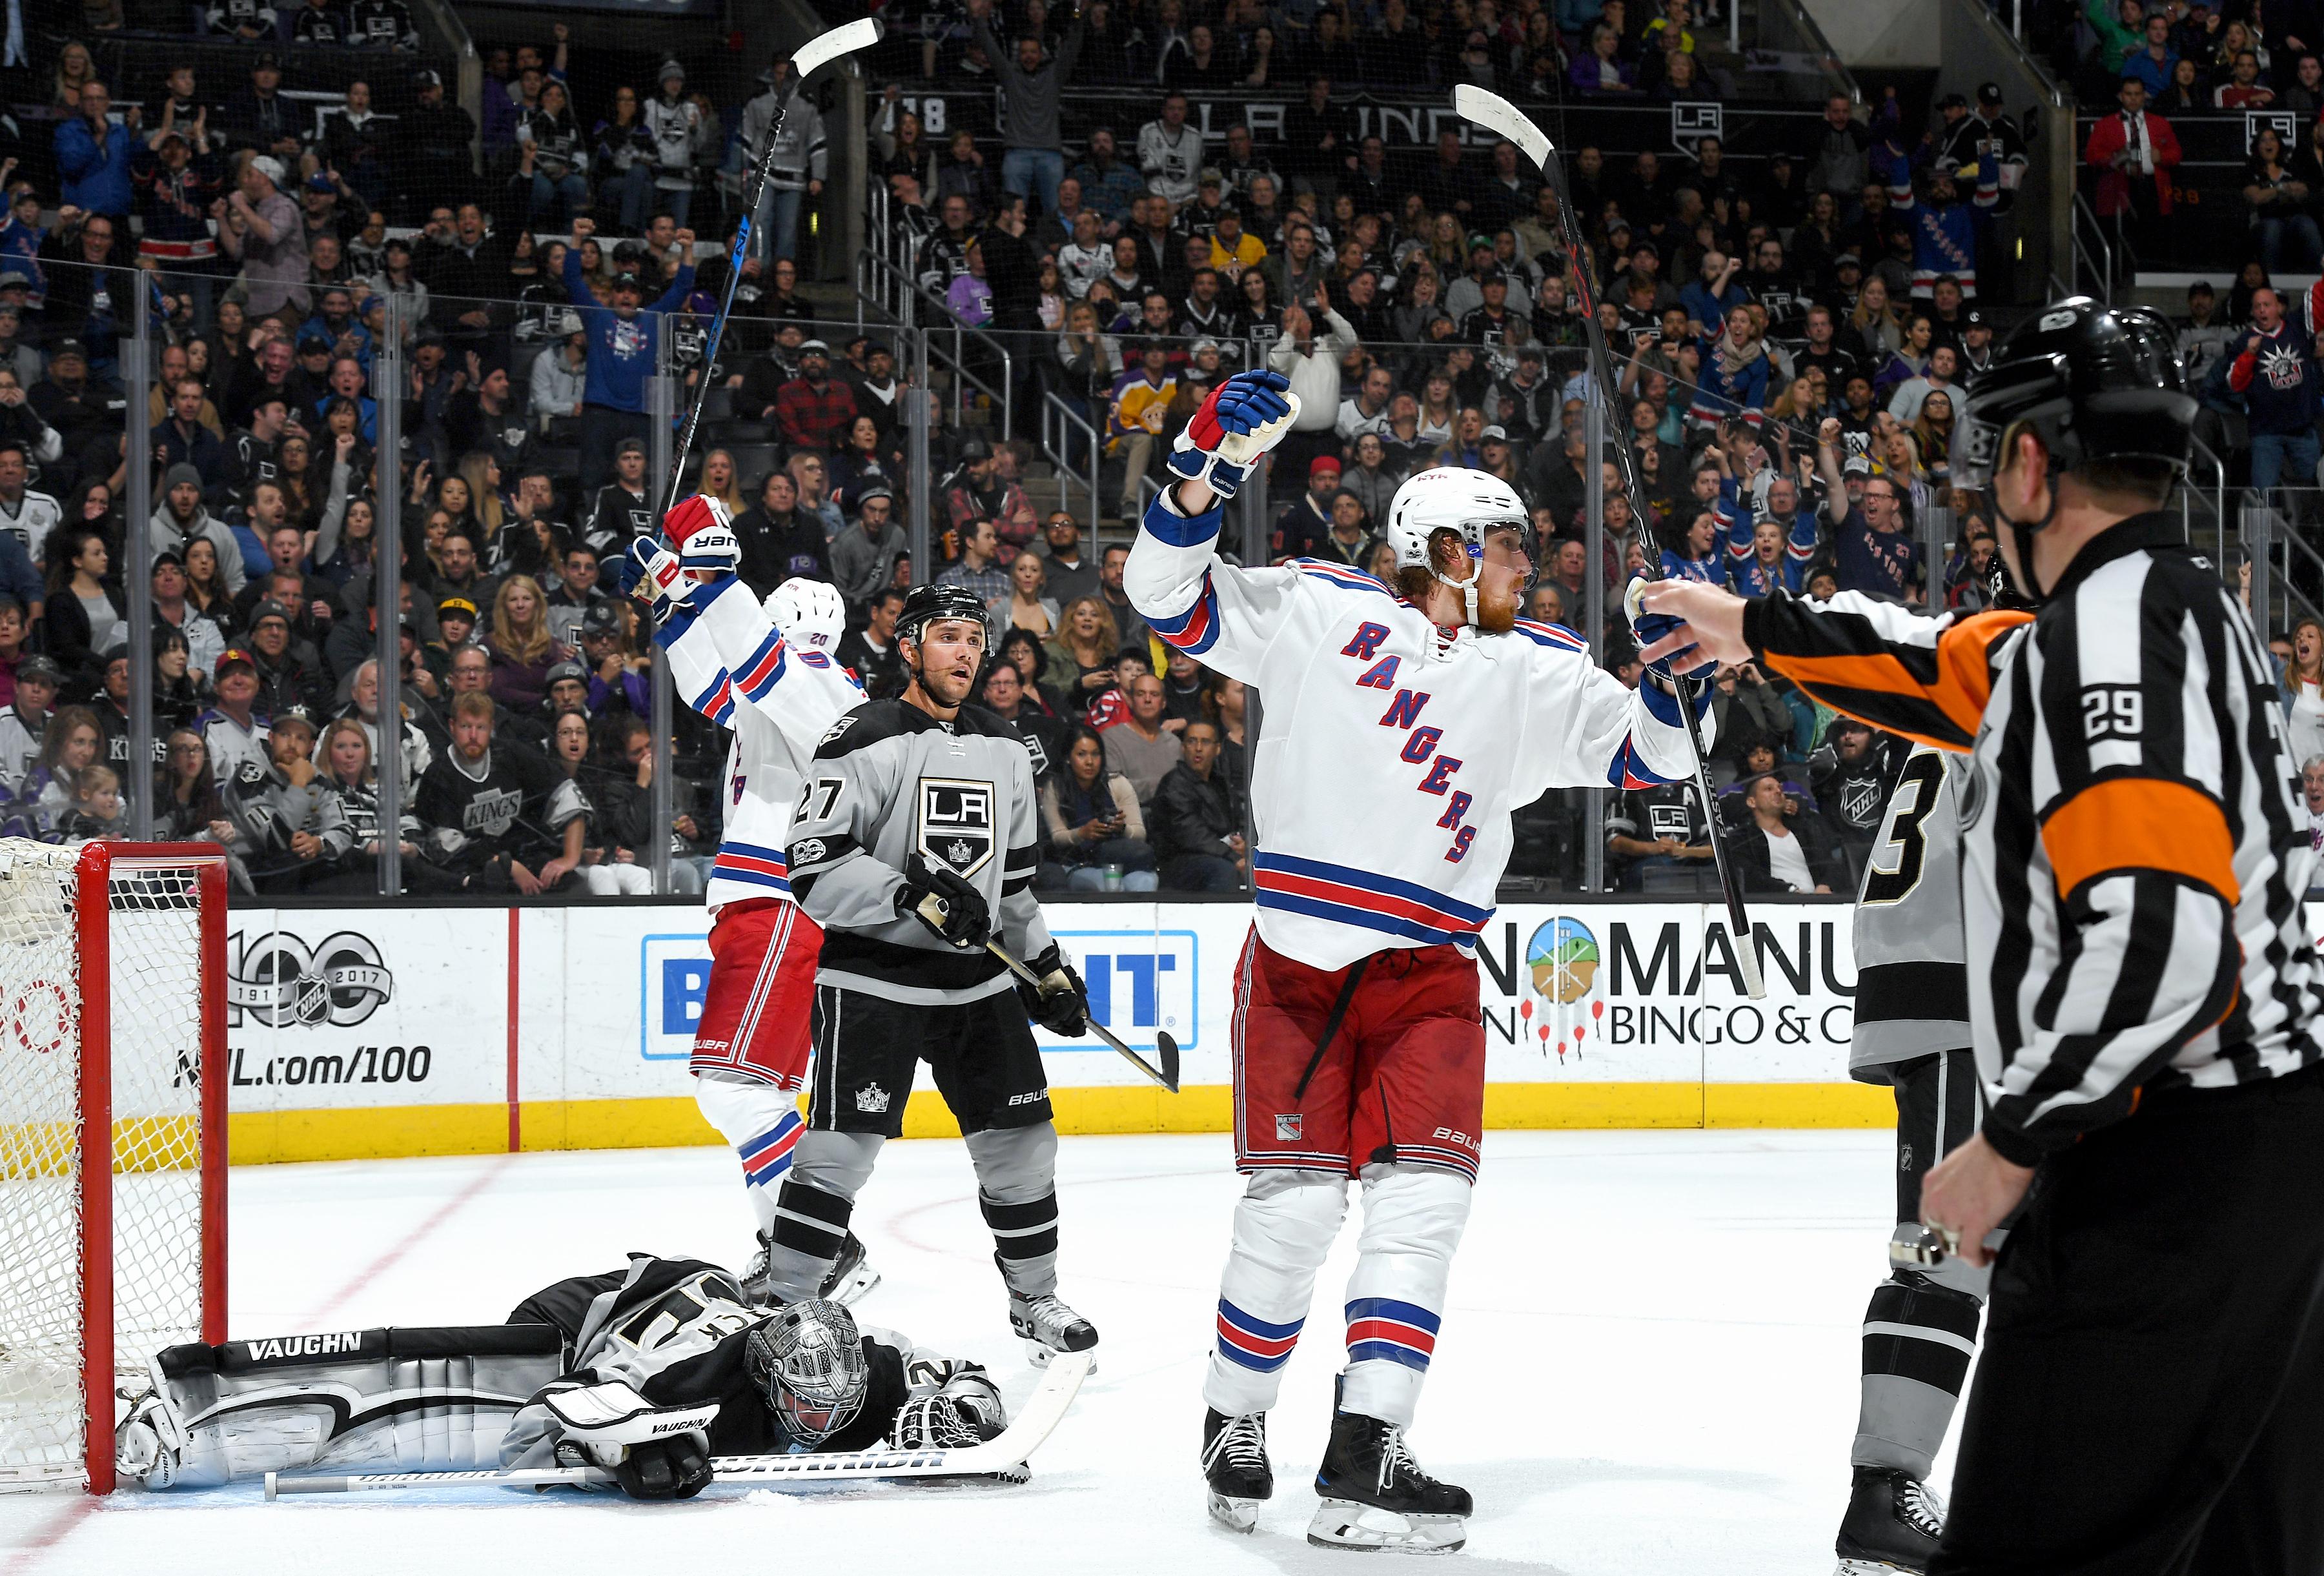 Nash shines as Rangers topple Kings